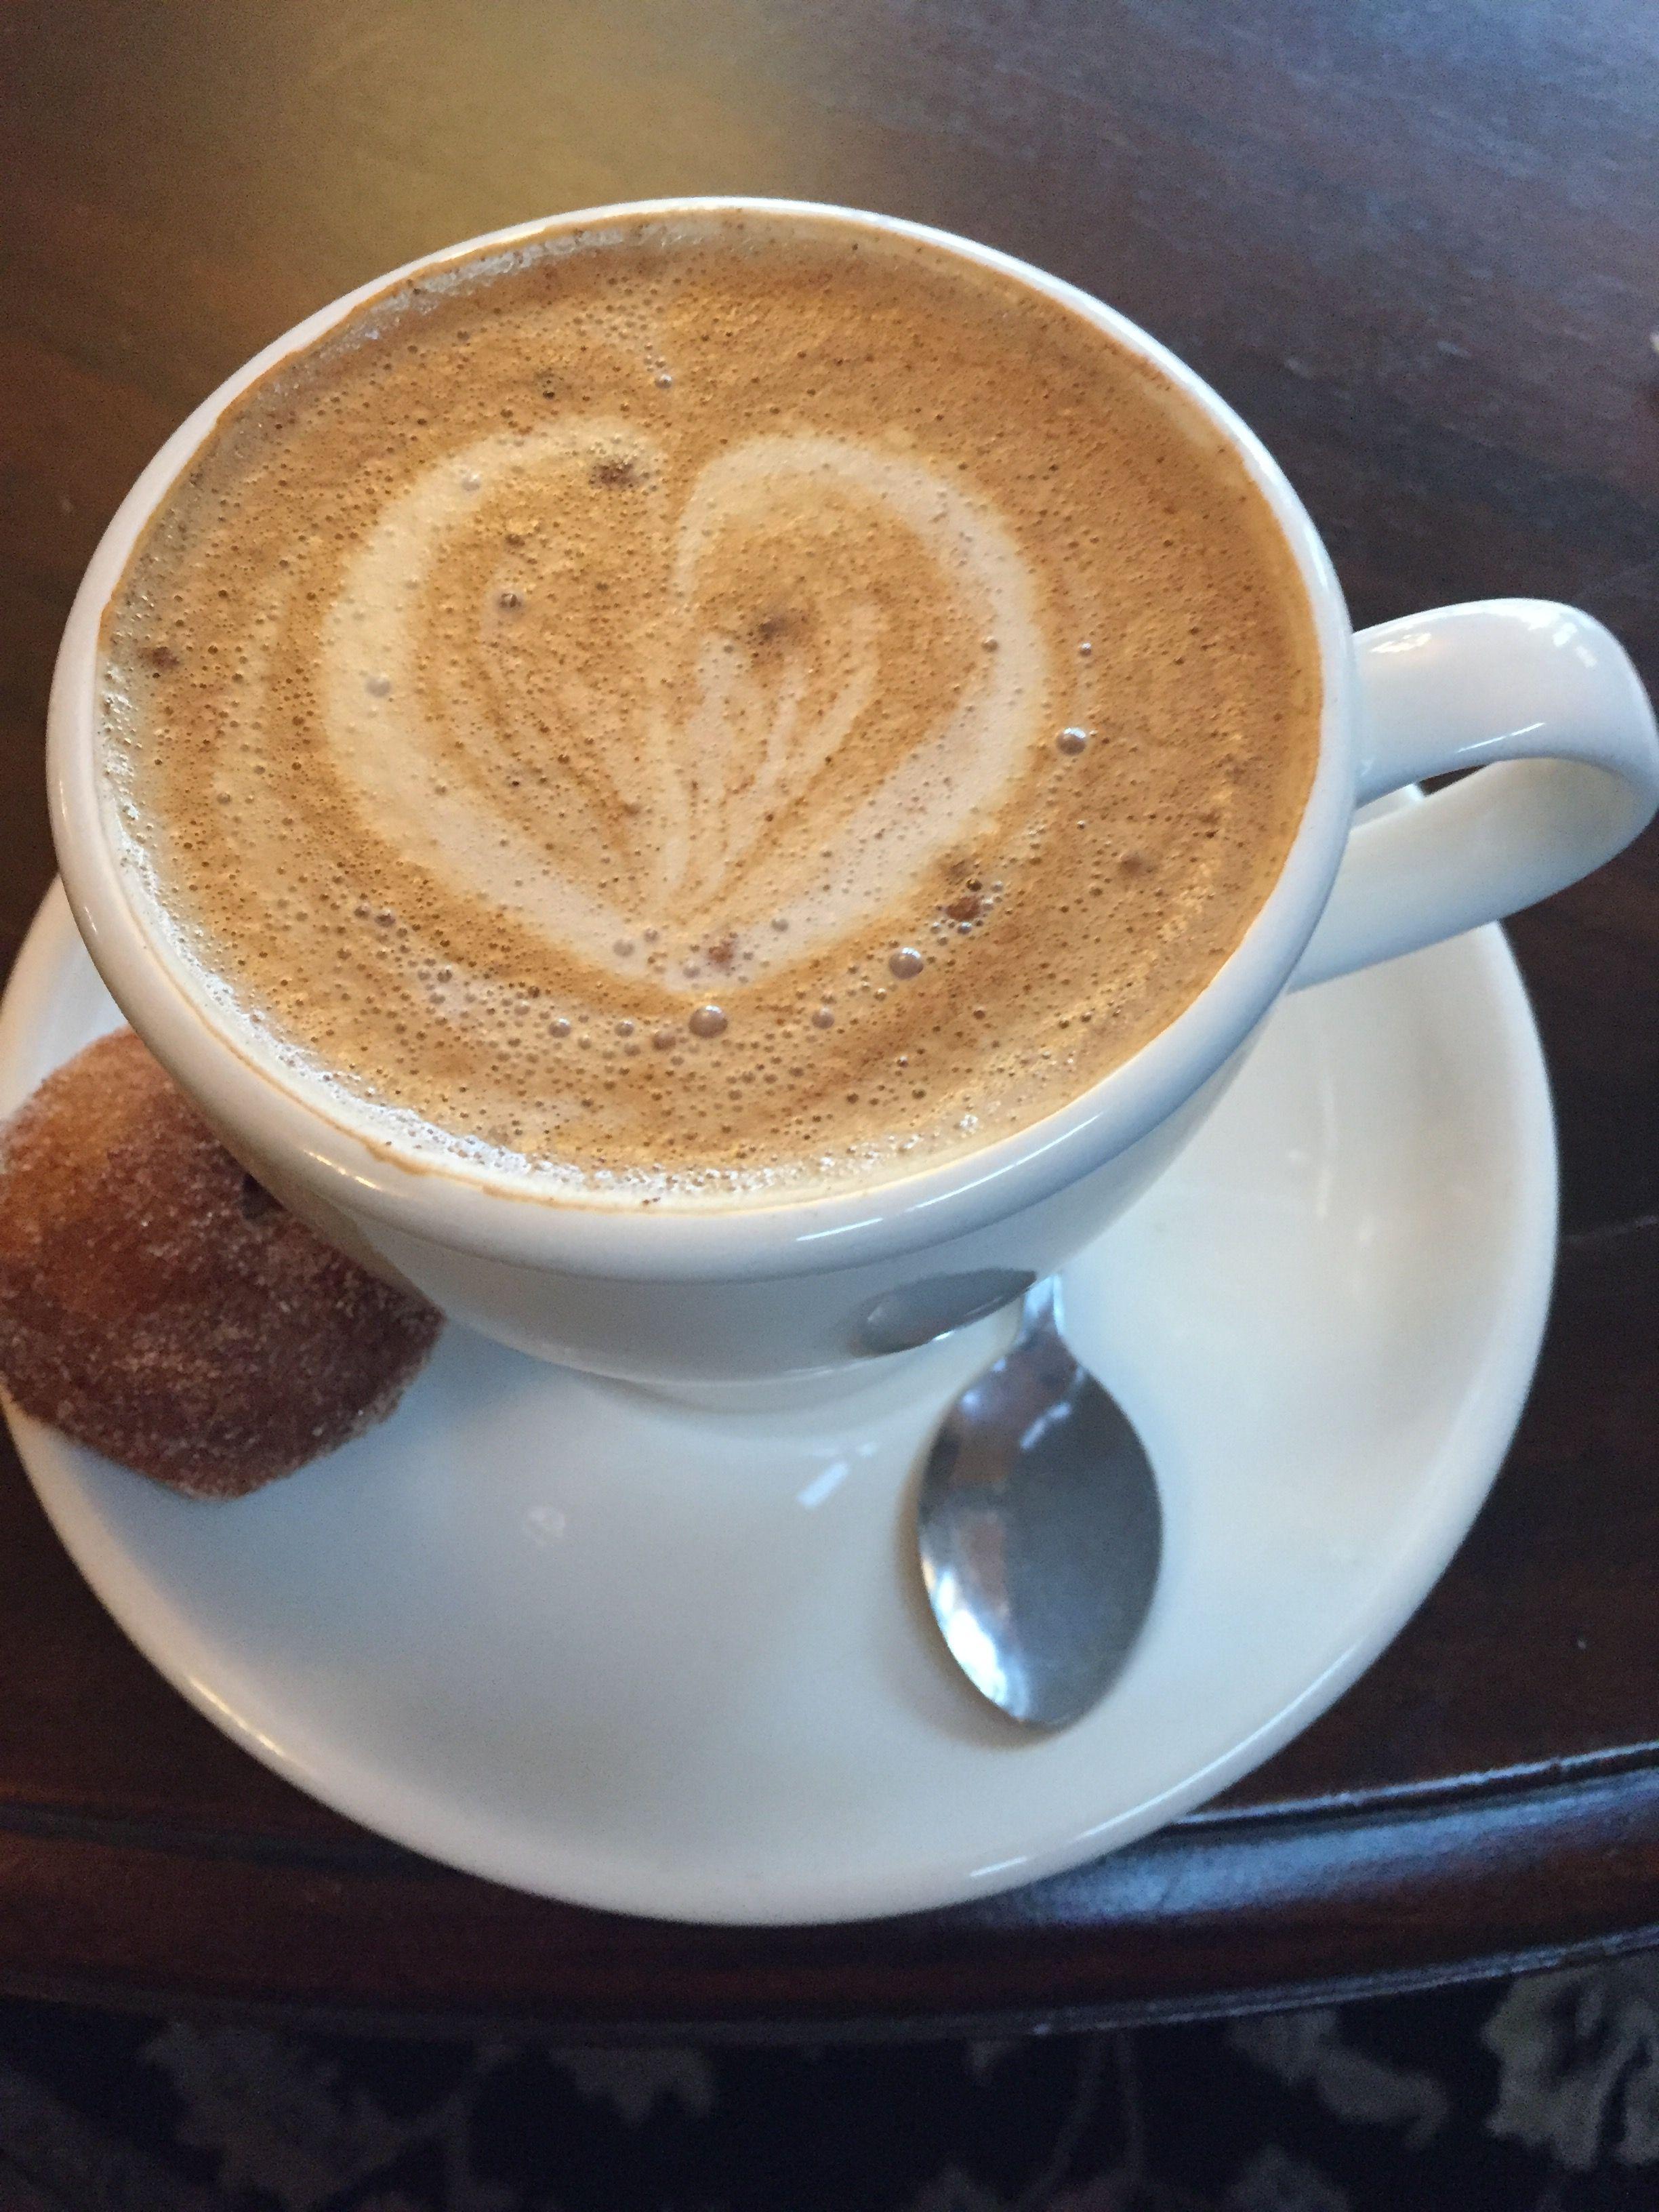 Pin by mahsan t on coffee&tea | Coffee, Coffee art, Latte art #coffeeShop